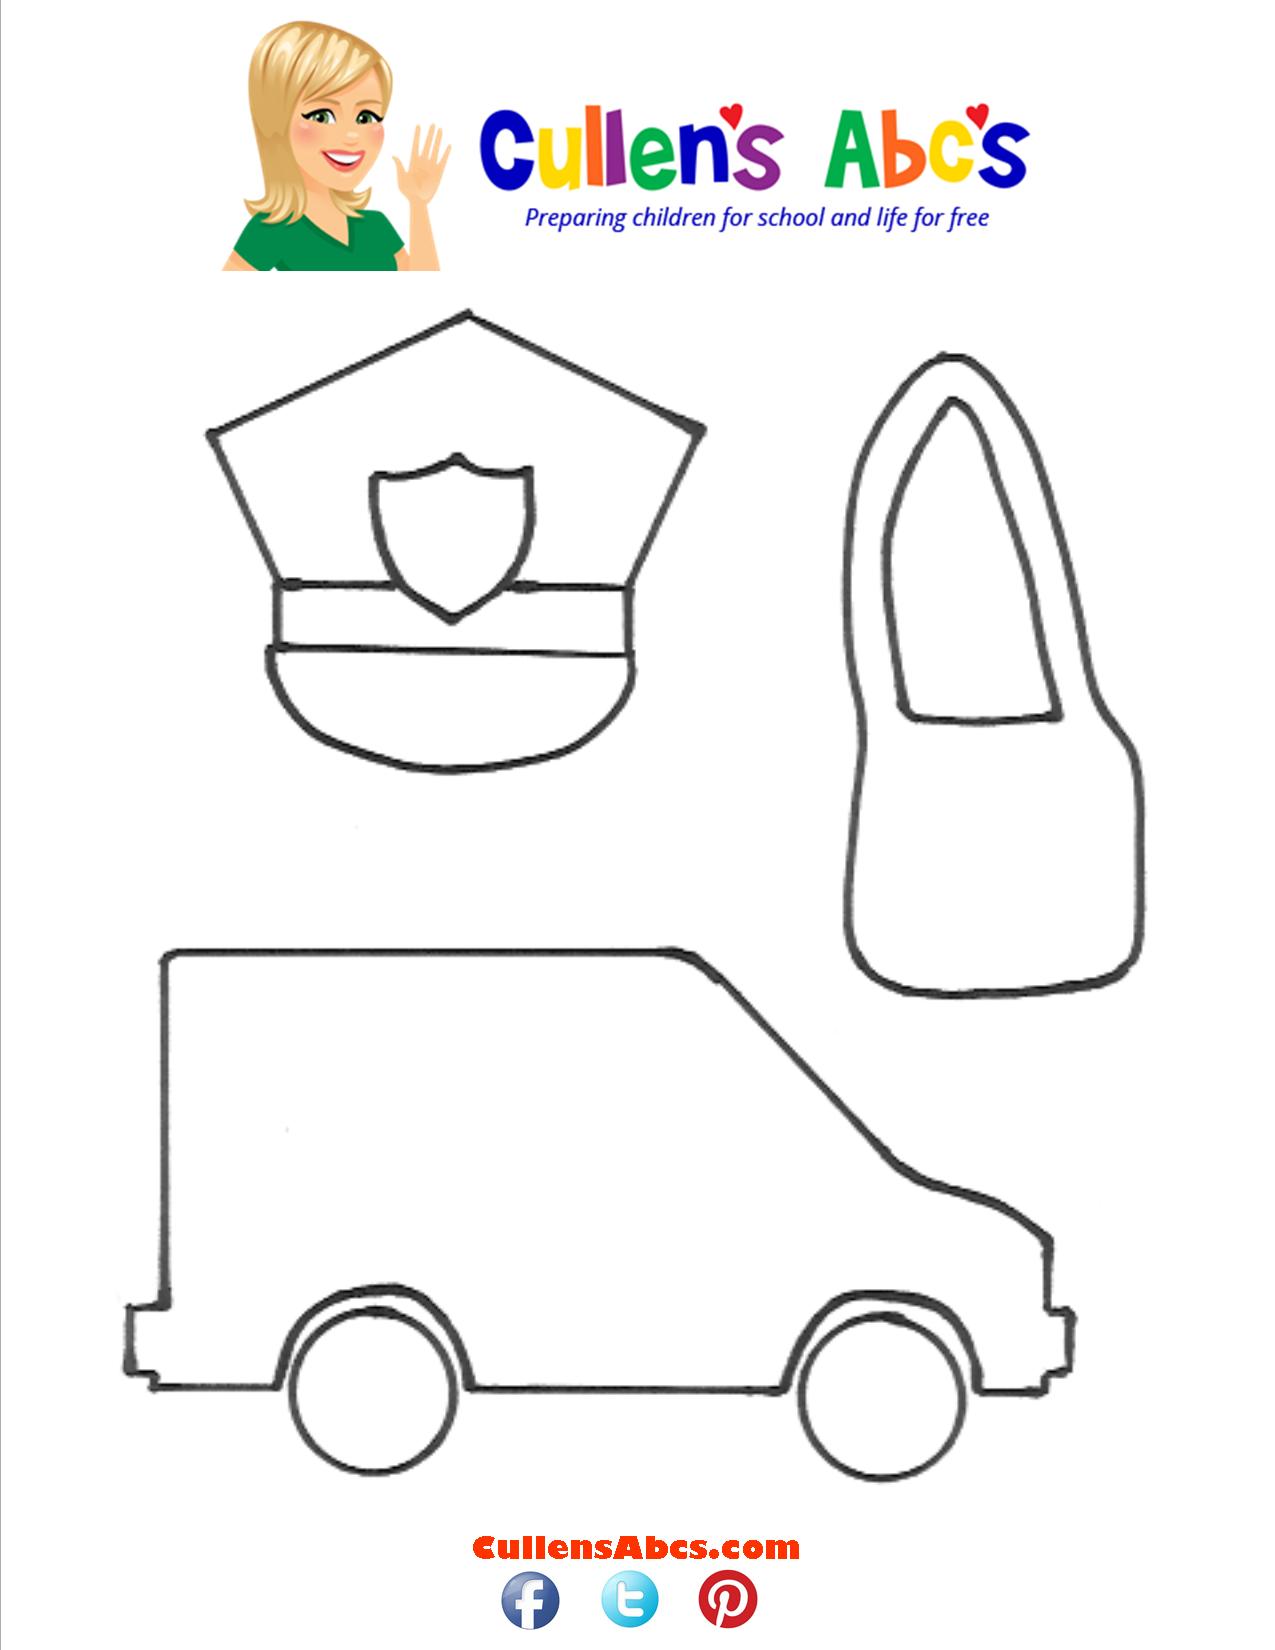 Mail Carrier Art Pattern